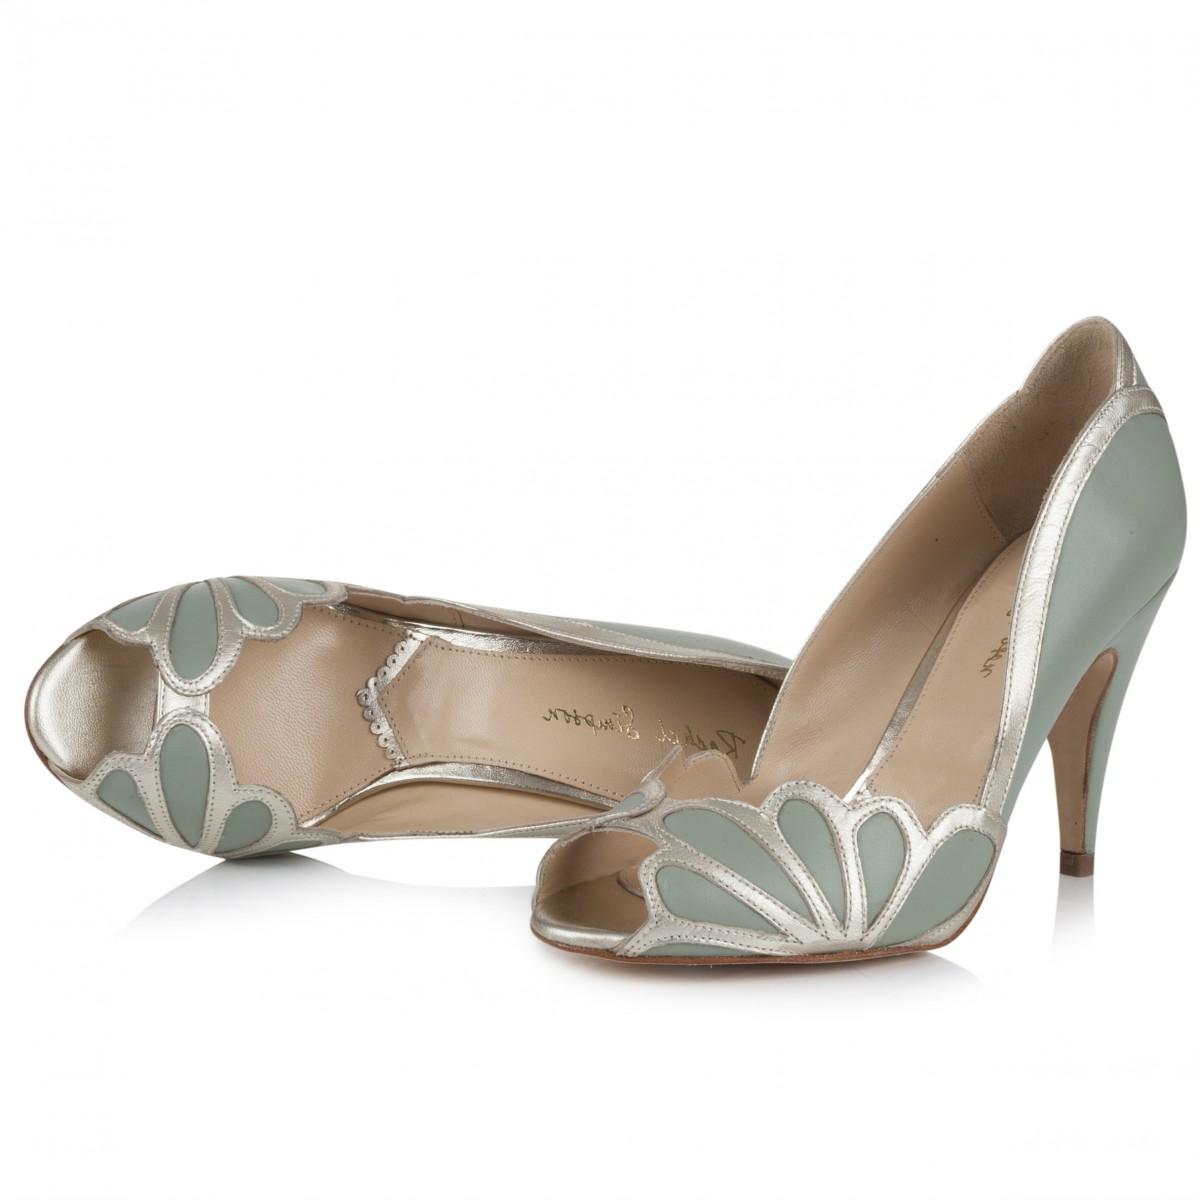 Wedding shoes - Isabelle mint by Rachel Simpson